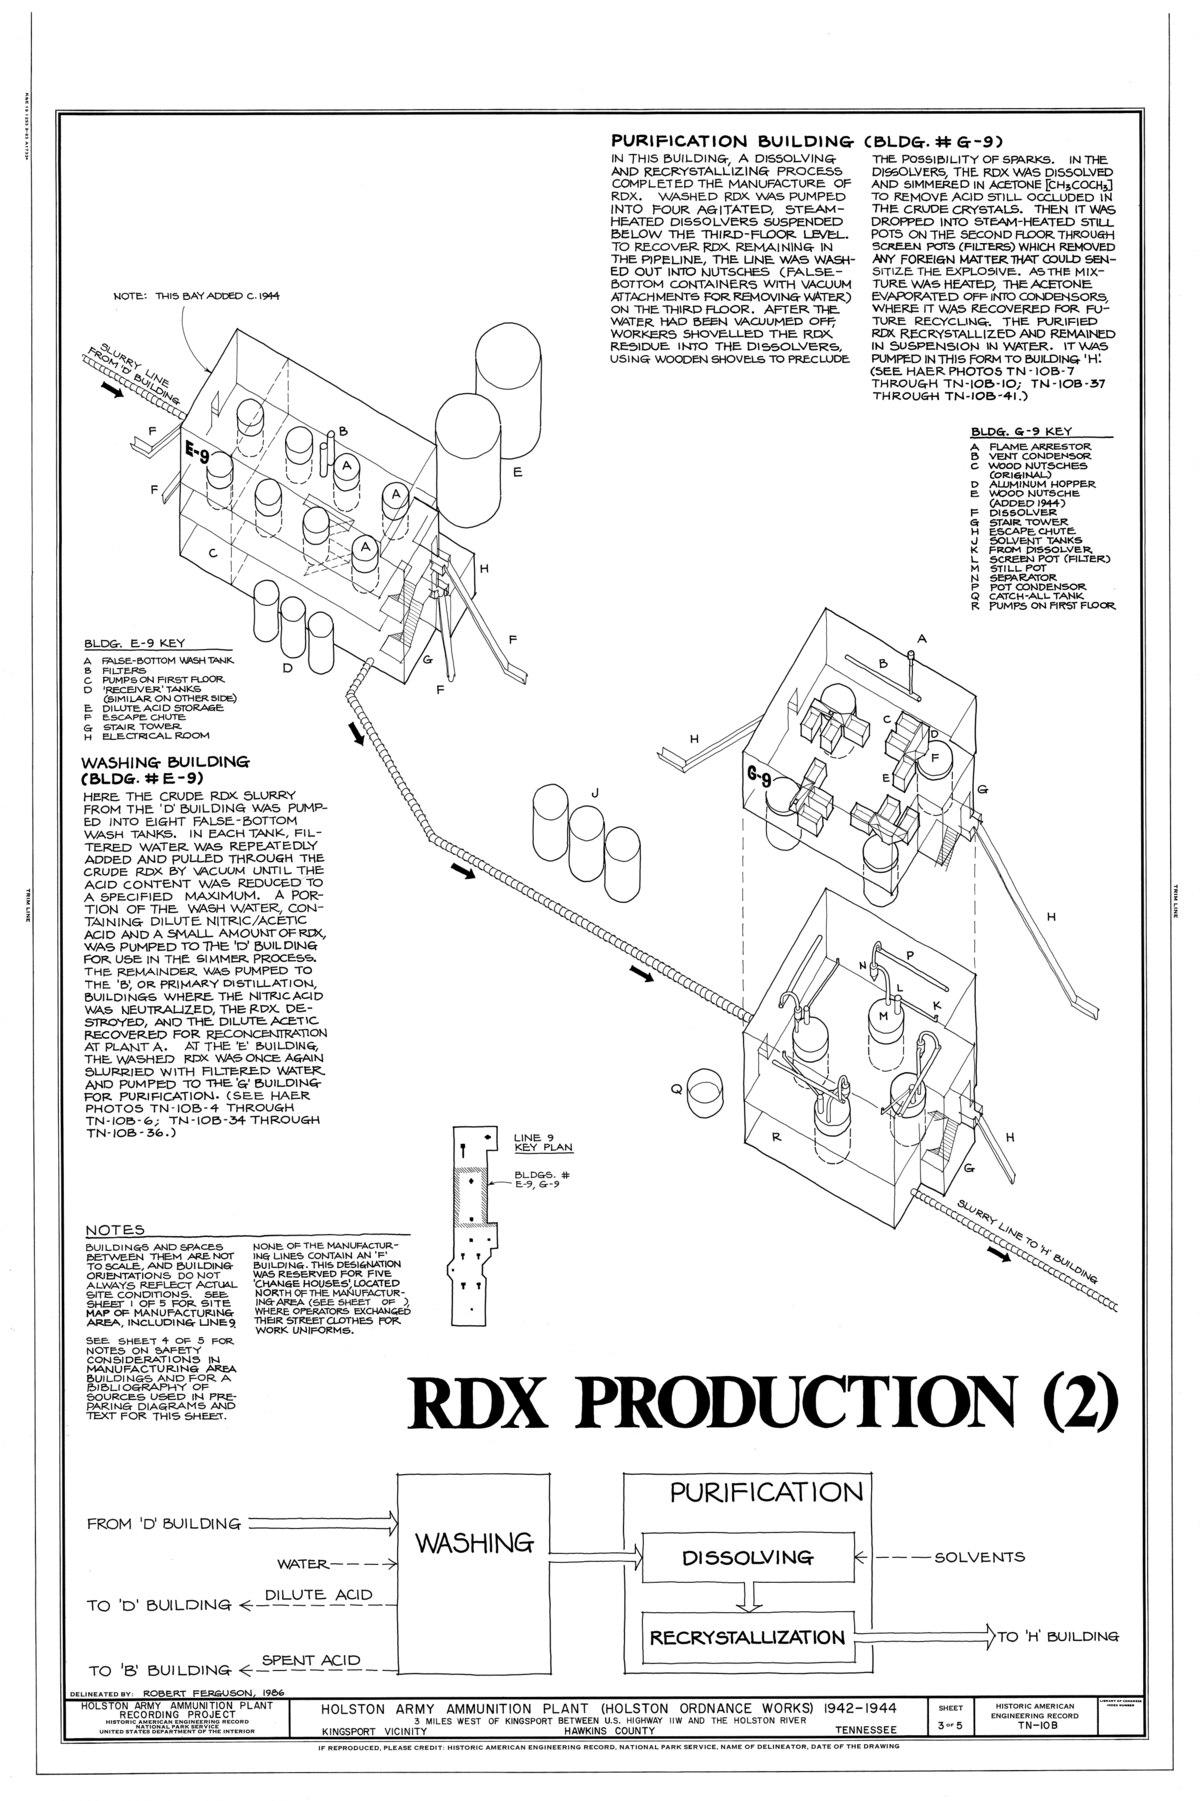 File Rdx Production 2